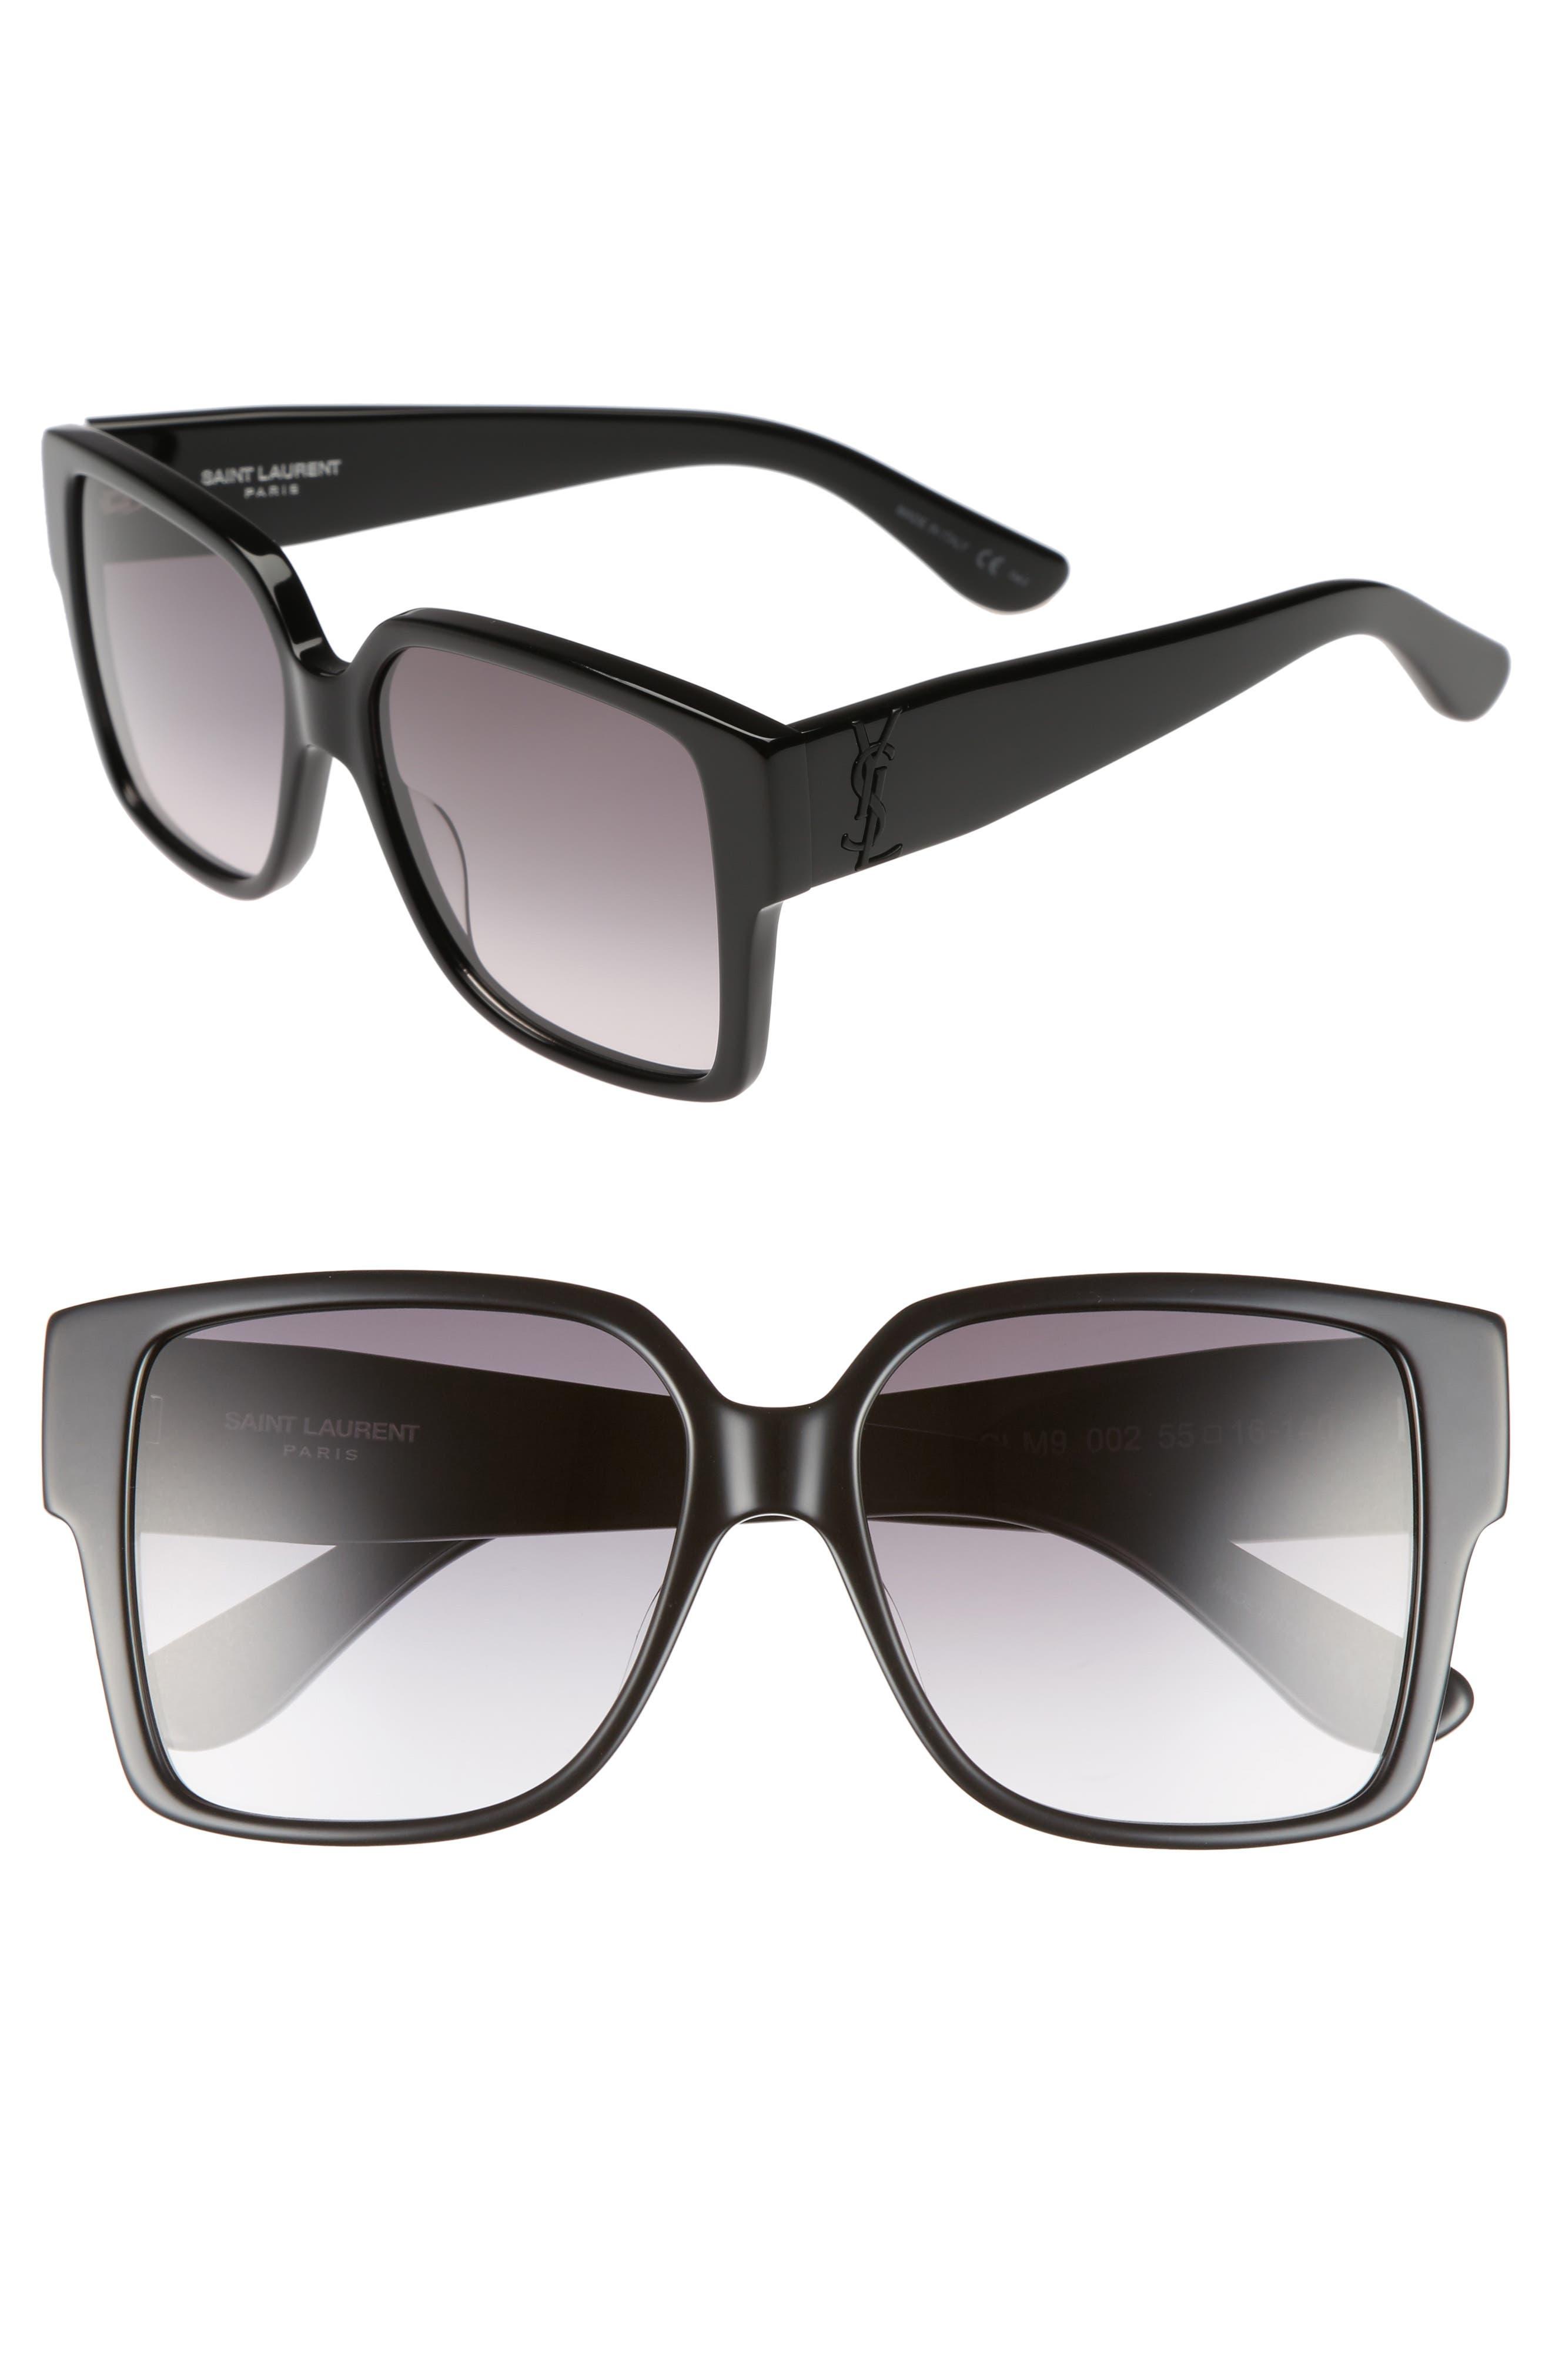 55mm Square Sunglasses,                         Main,                         color, Black/ Black/ Grey